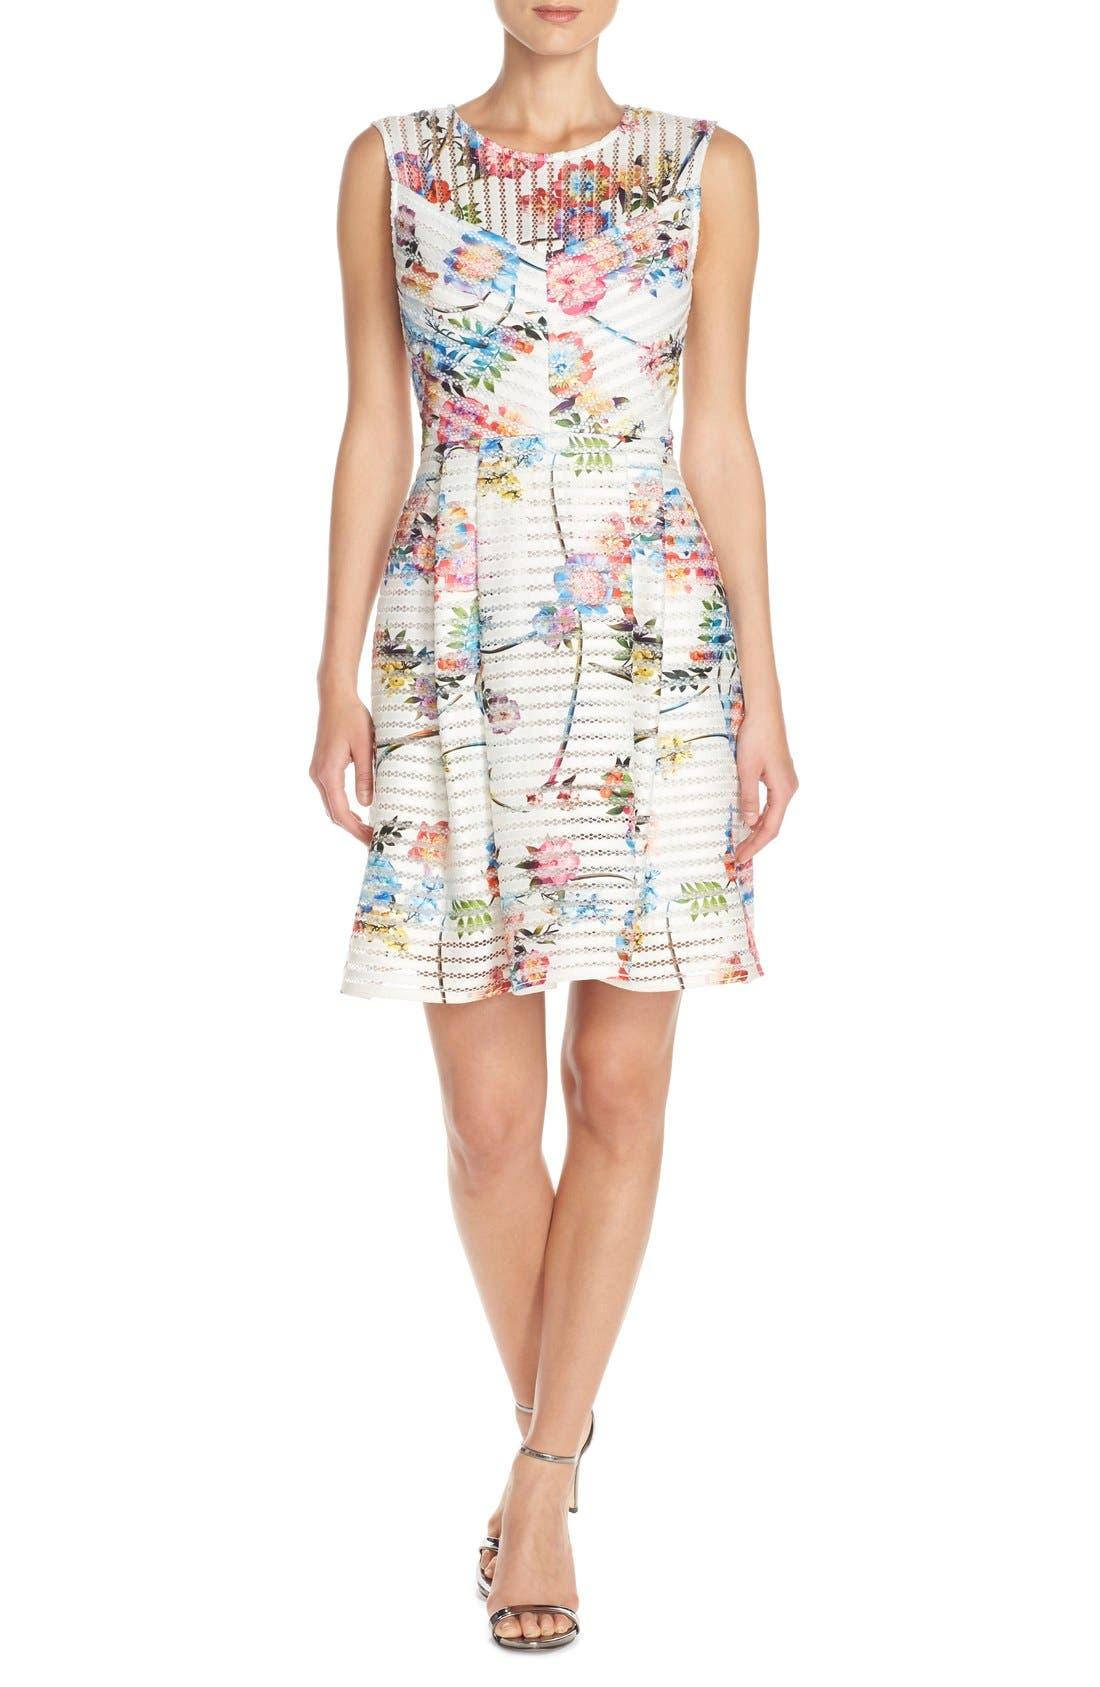 Alternate Image 1 Selected - Gabby Skye Floral Scuba Mesh Fit & Flare Dress